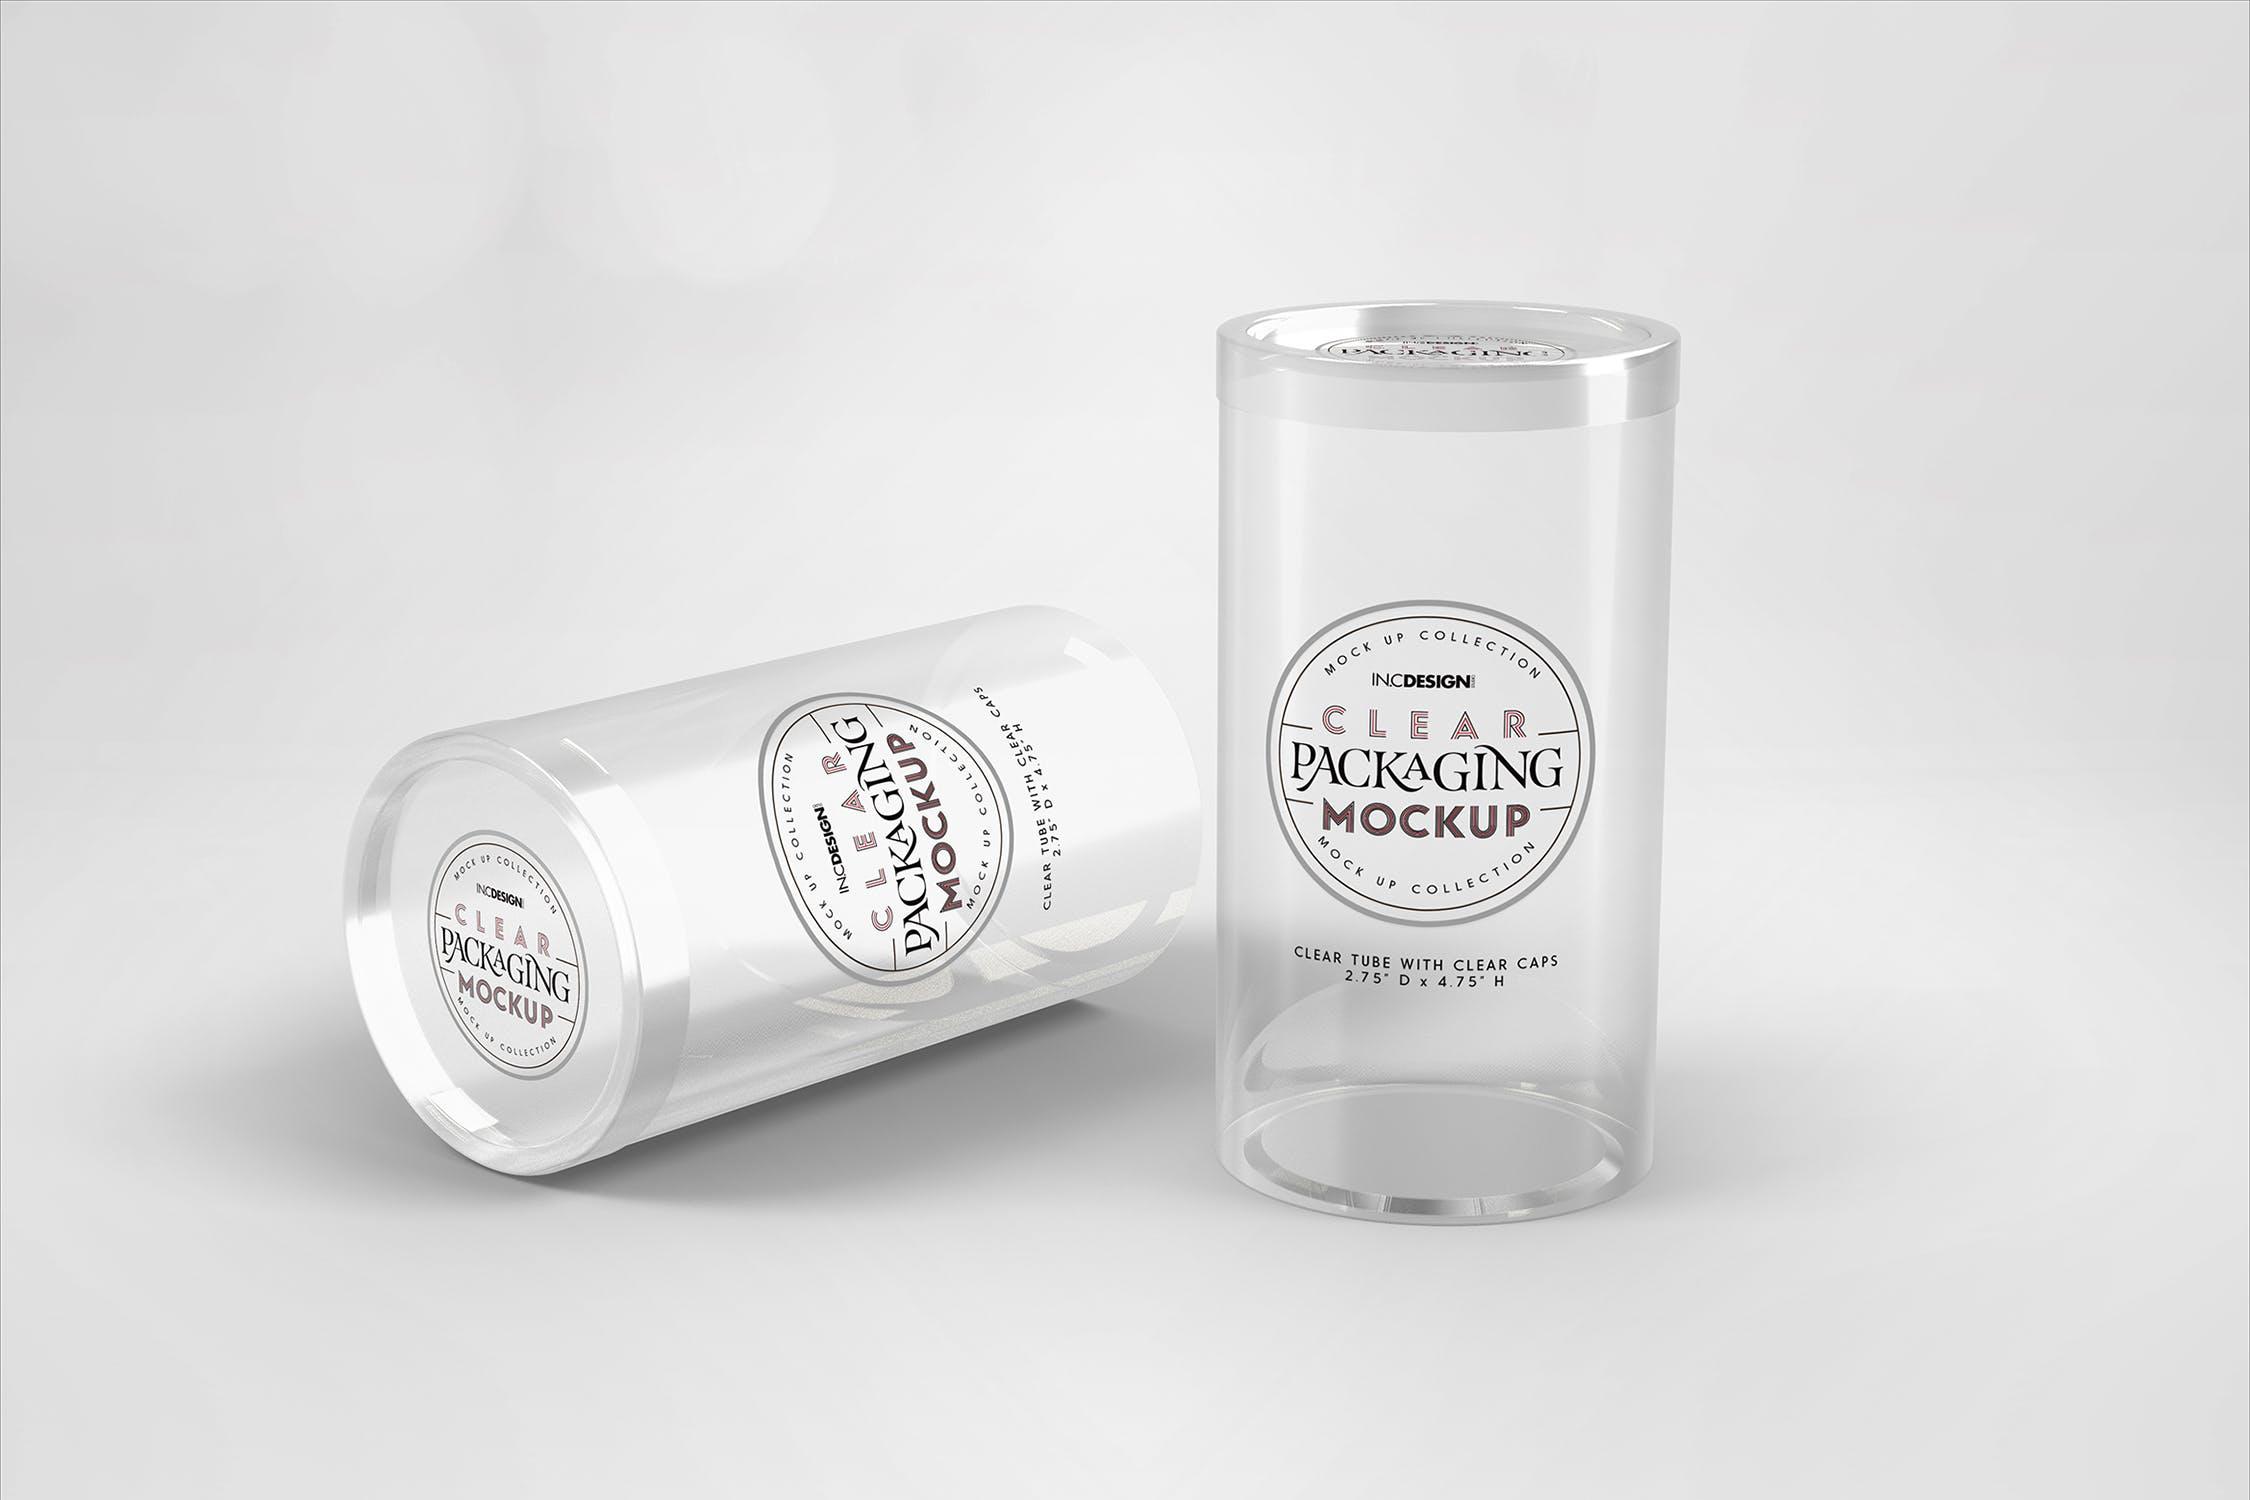 带透明盖帽样品的透明圆筒包装样机素材模板展示Clear Cylinder Packaging with Clear Caps Mockup